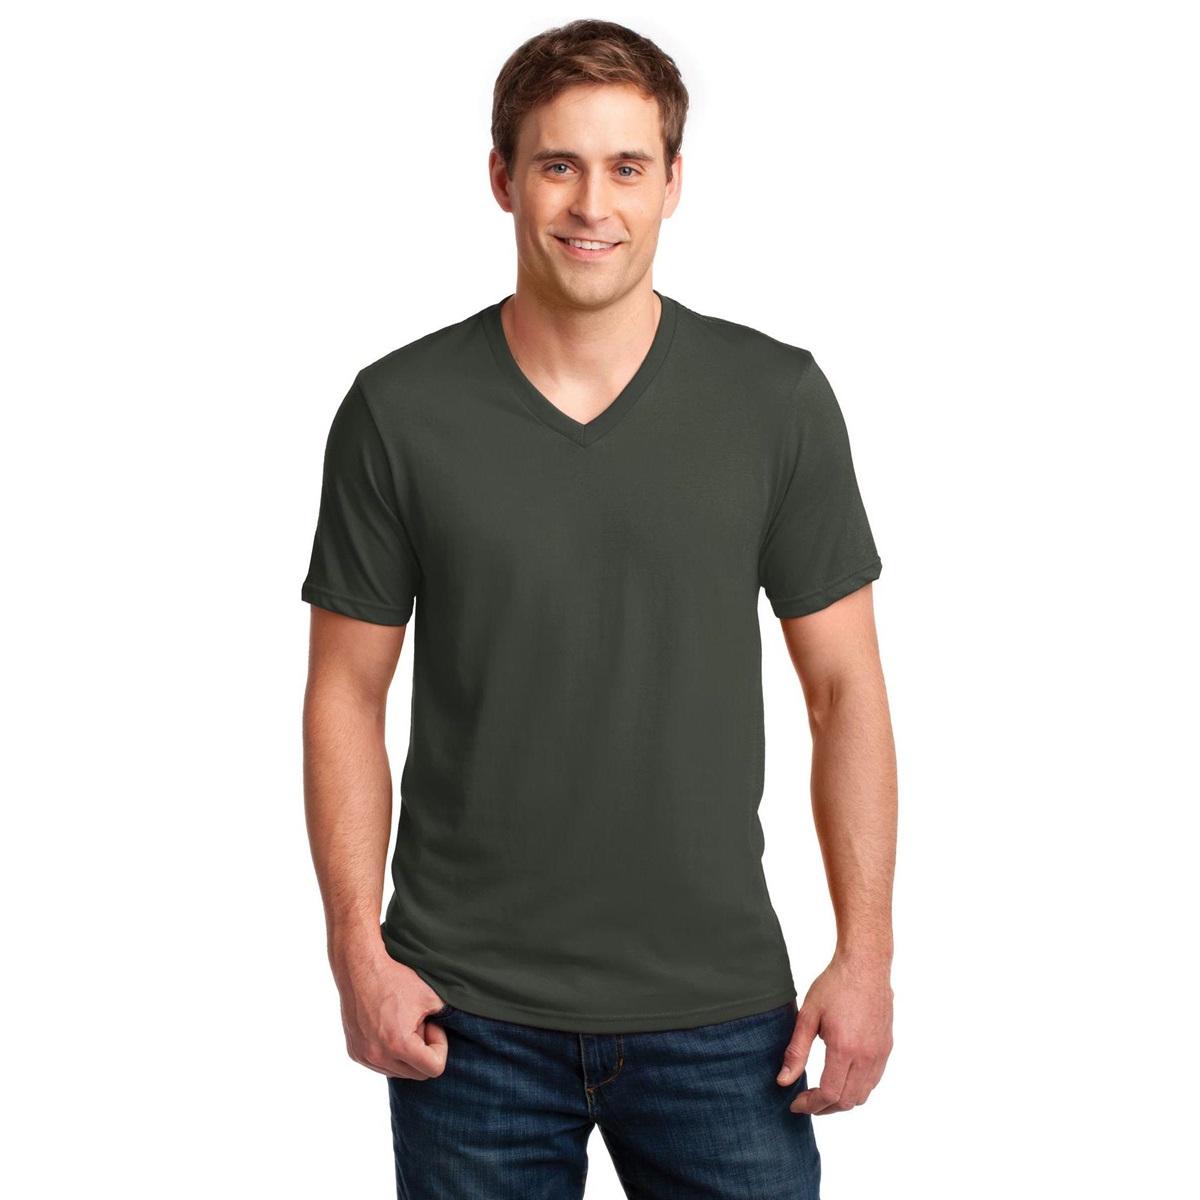 Anvil 982 100 ring spun cotton v neck t shirt city for 100 ringspun cotton t shirt wholesale